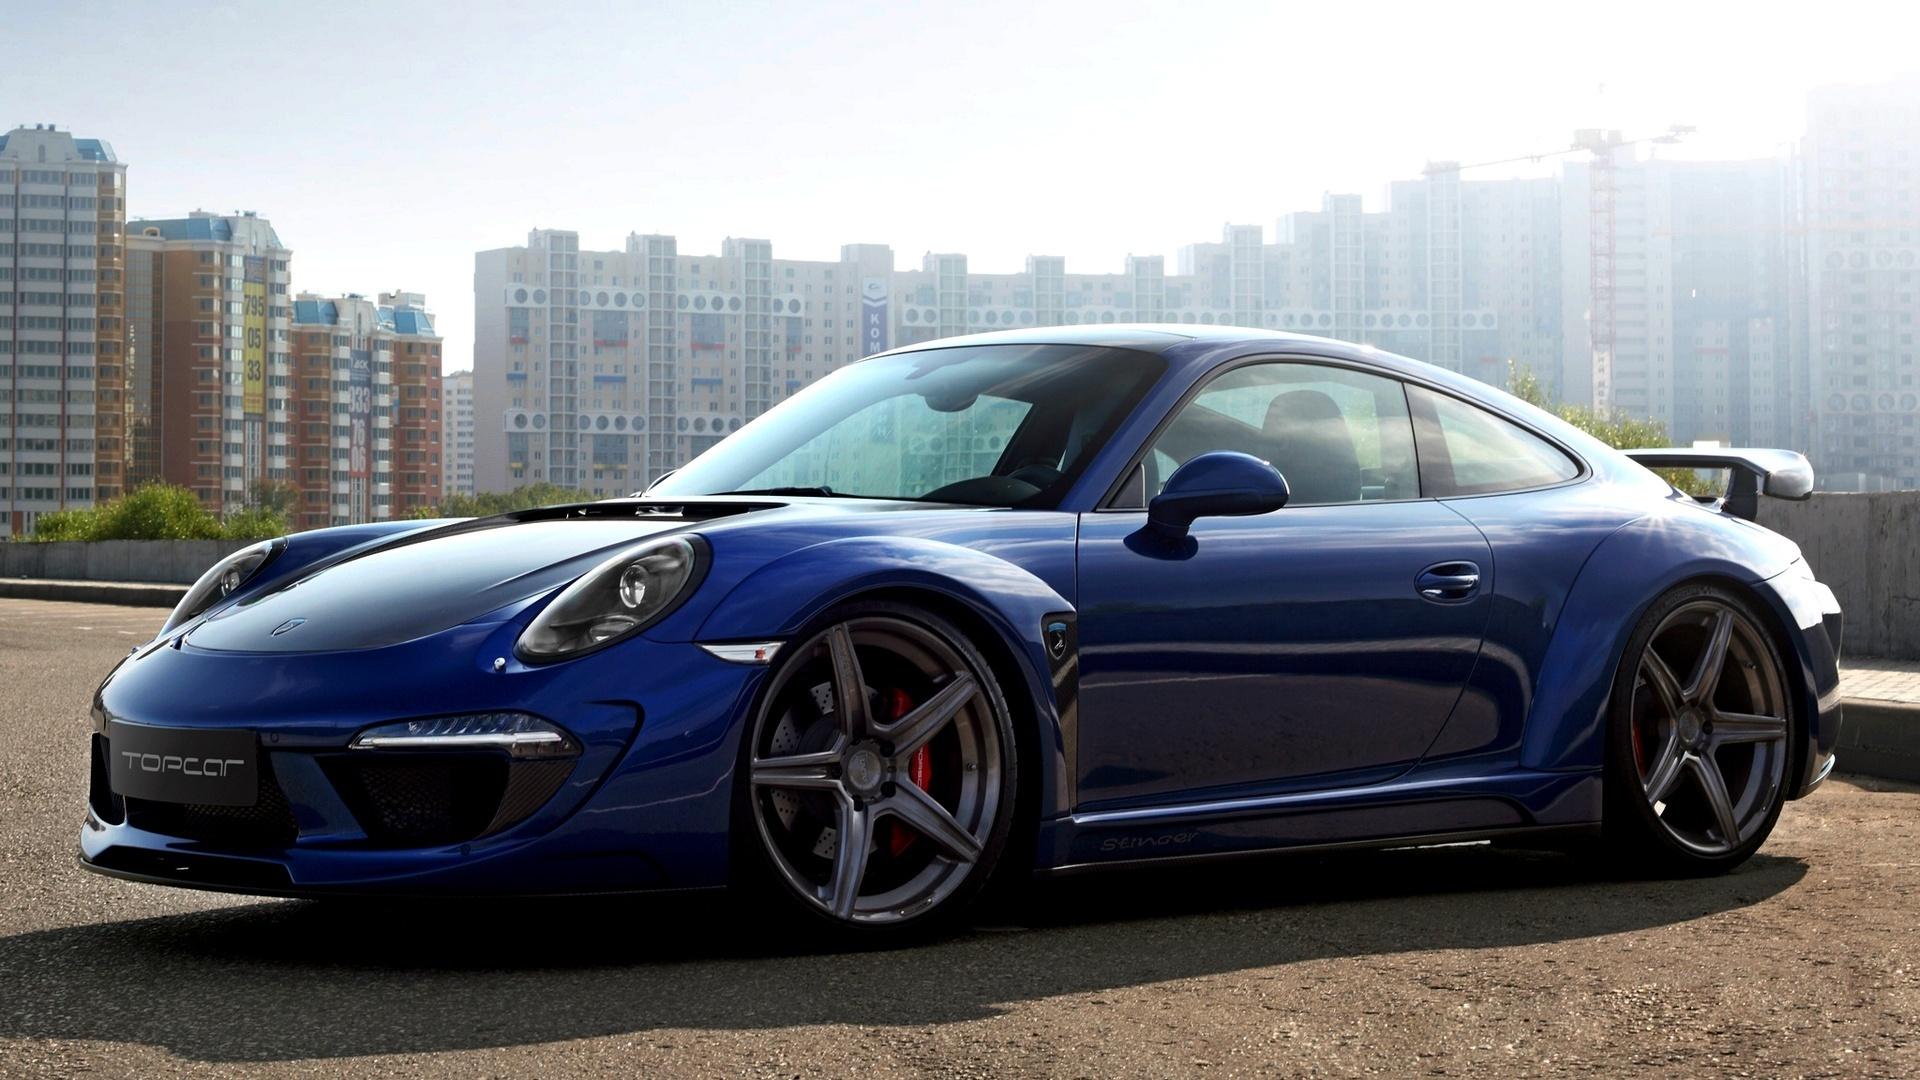 Porsche 911 Wallpapers Pictures Images 1920x1080